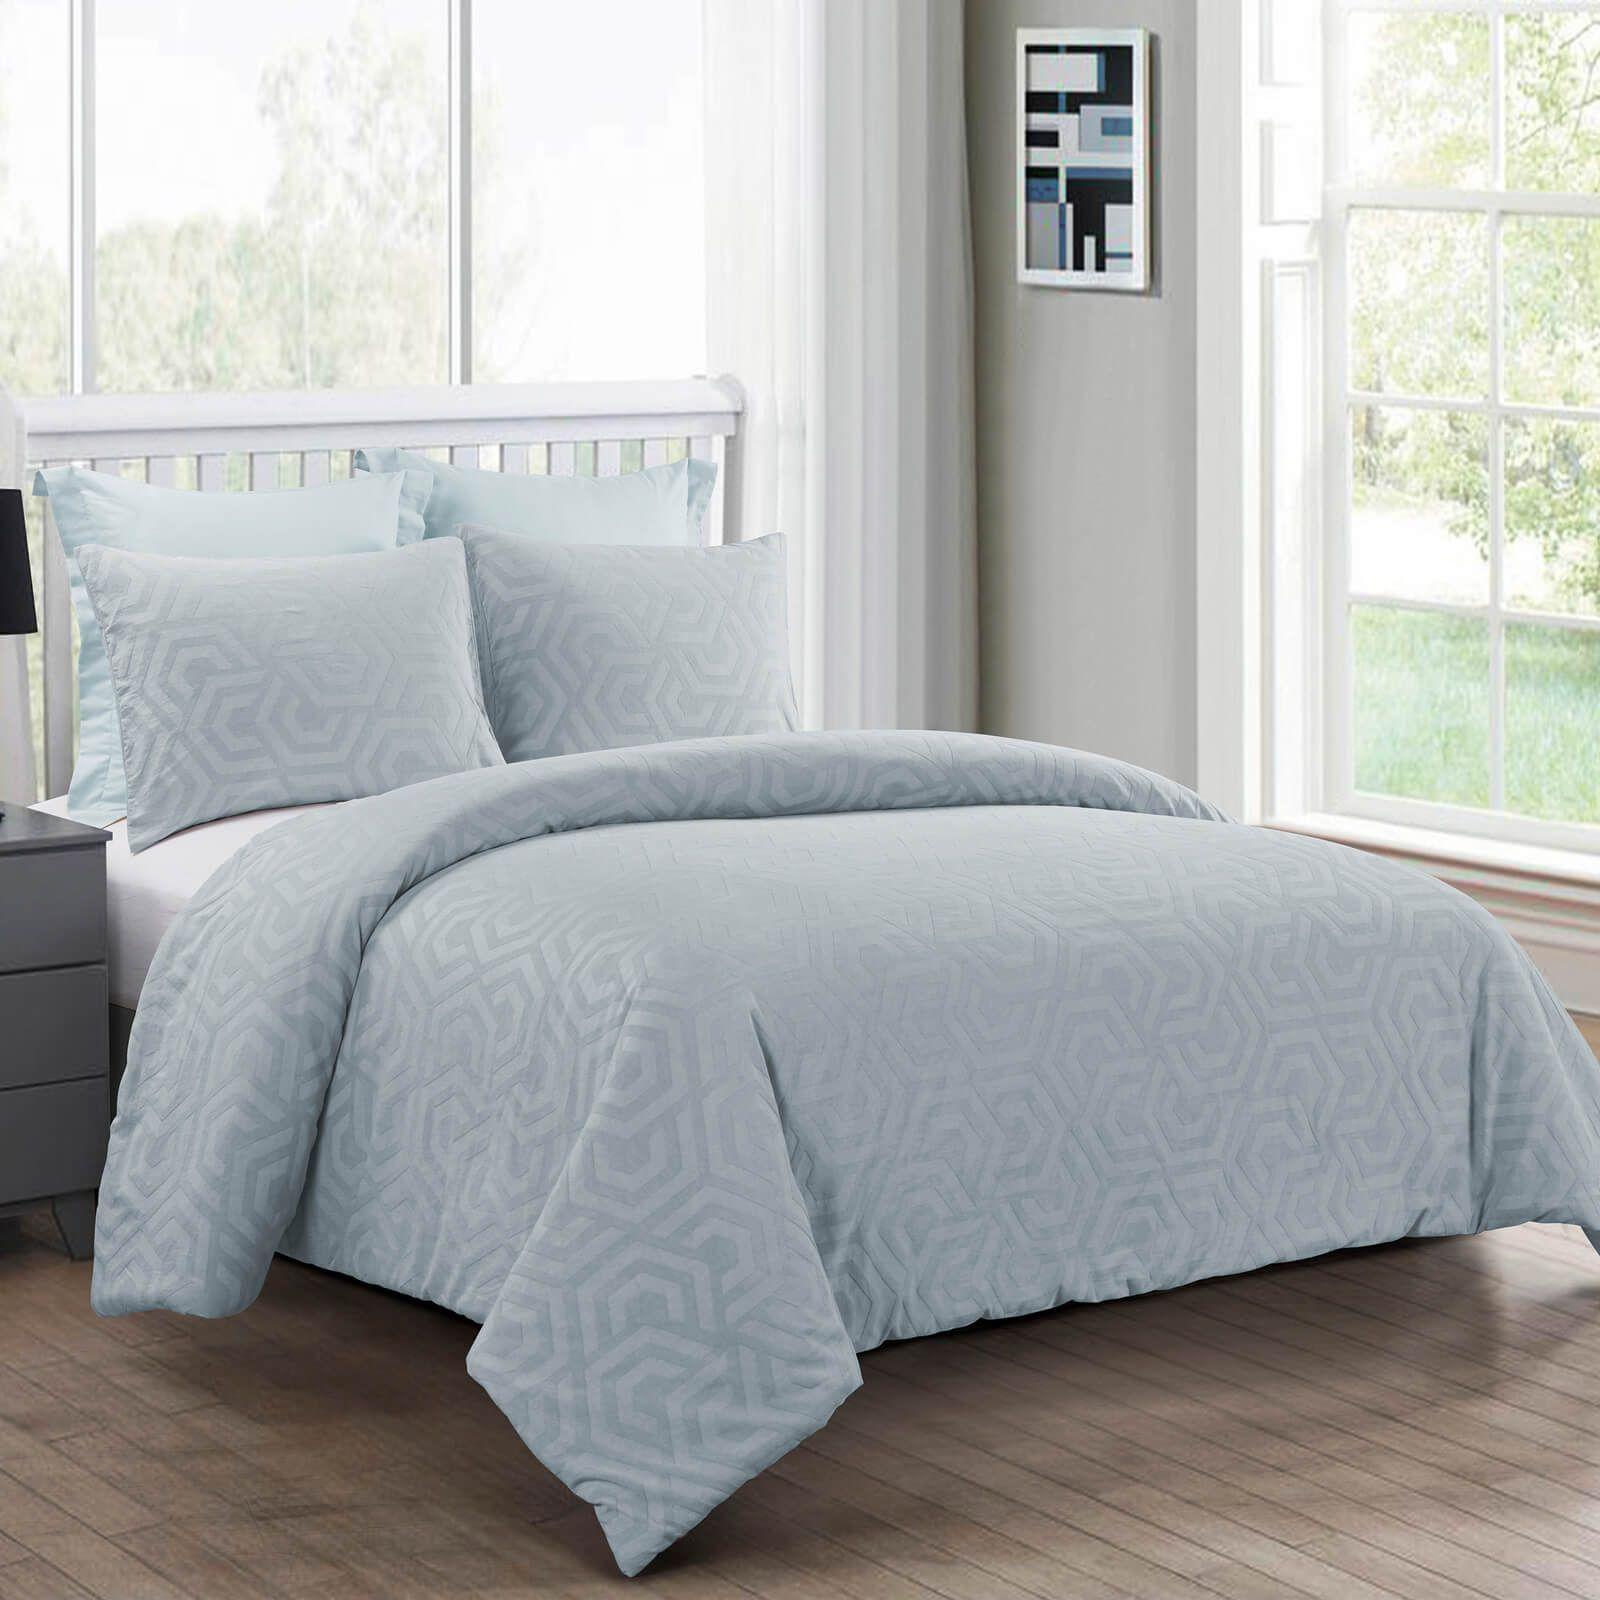 queen comforter set seville soft blue